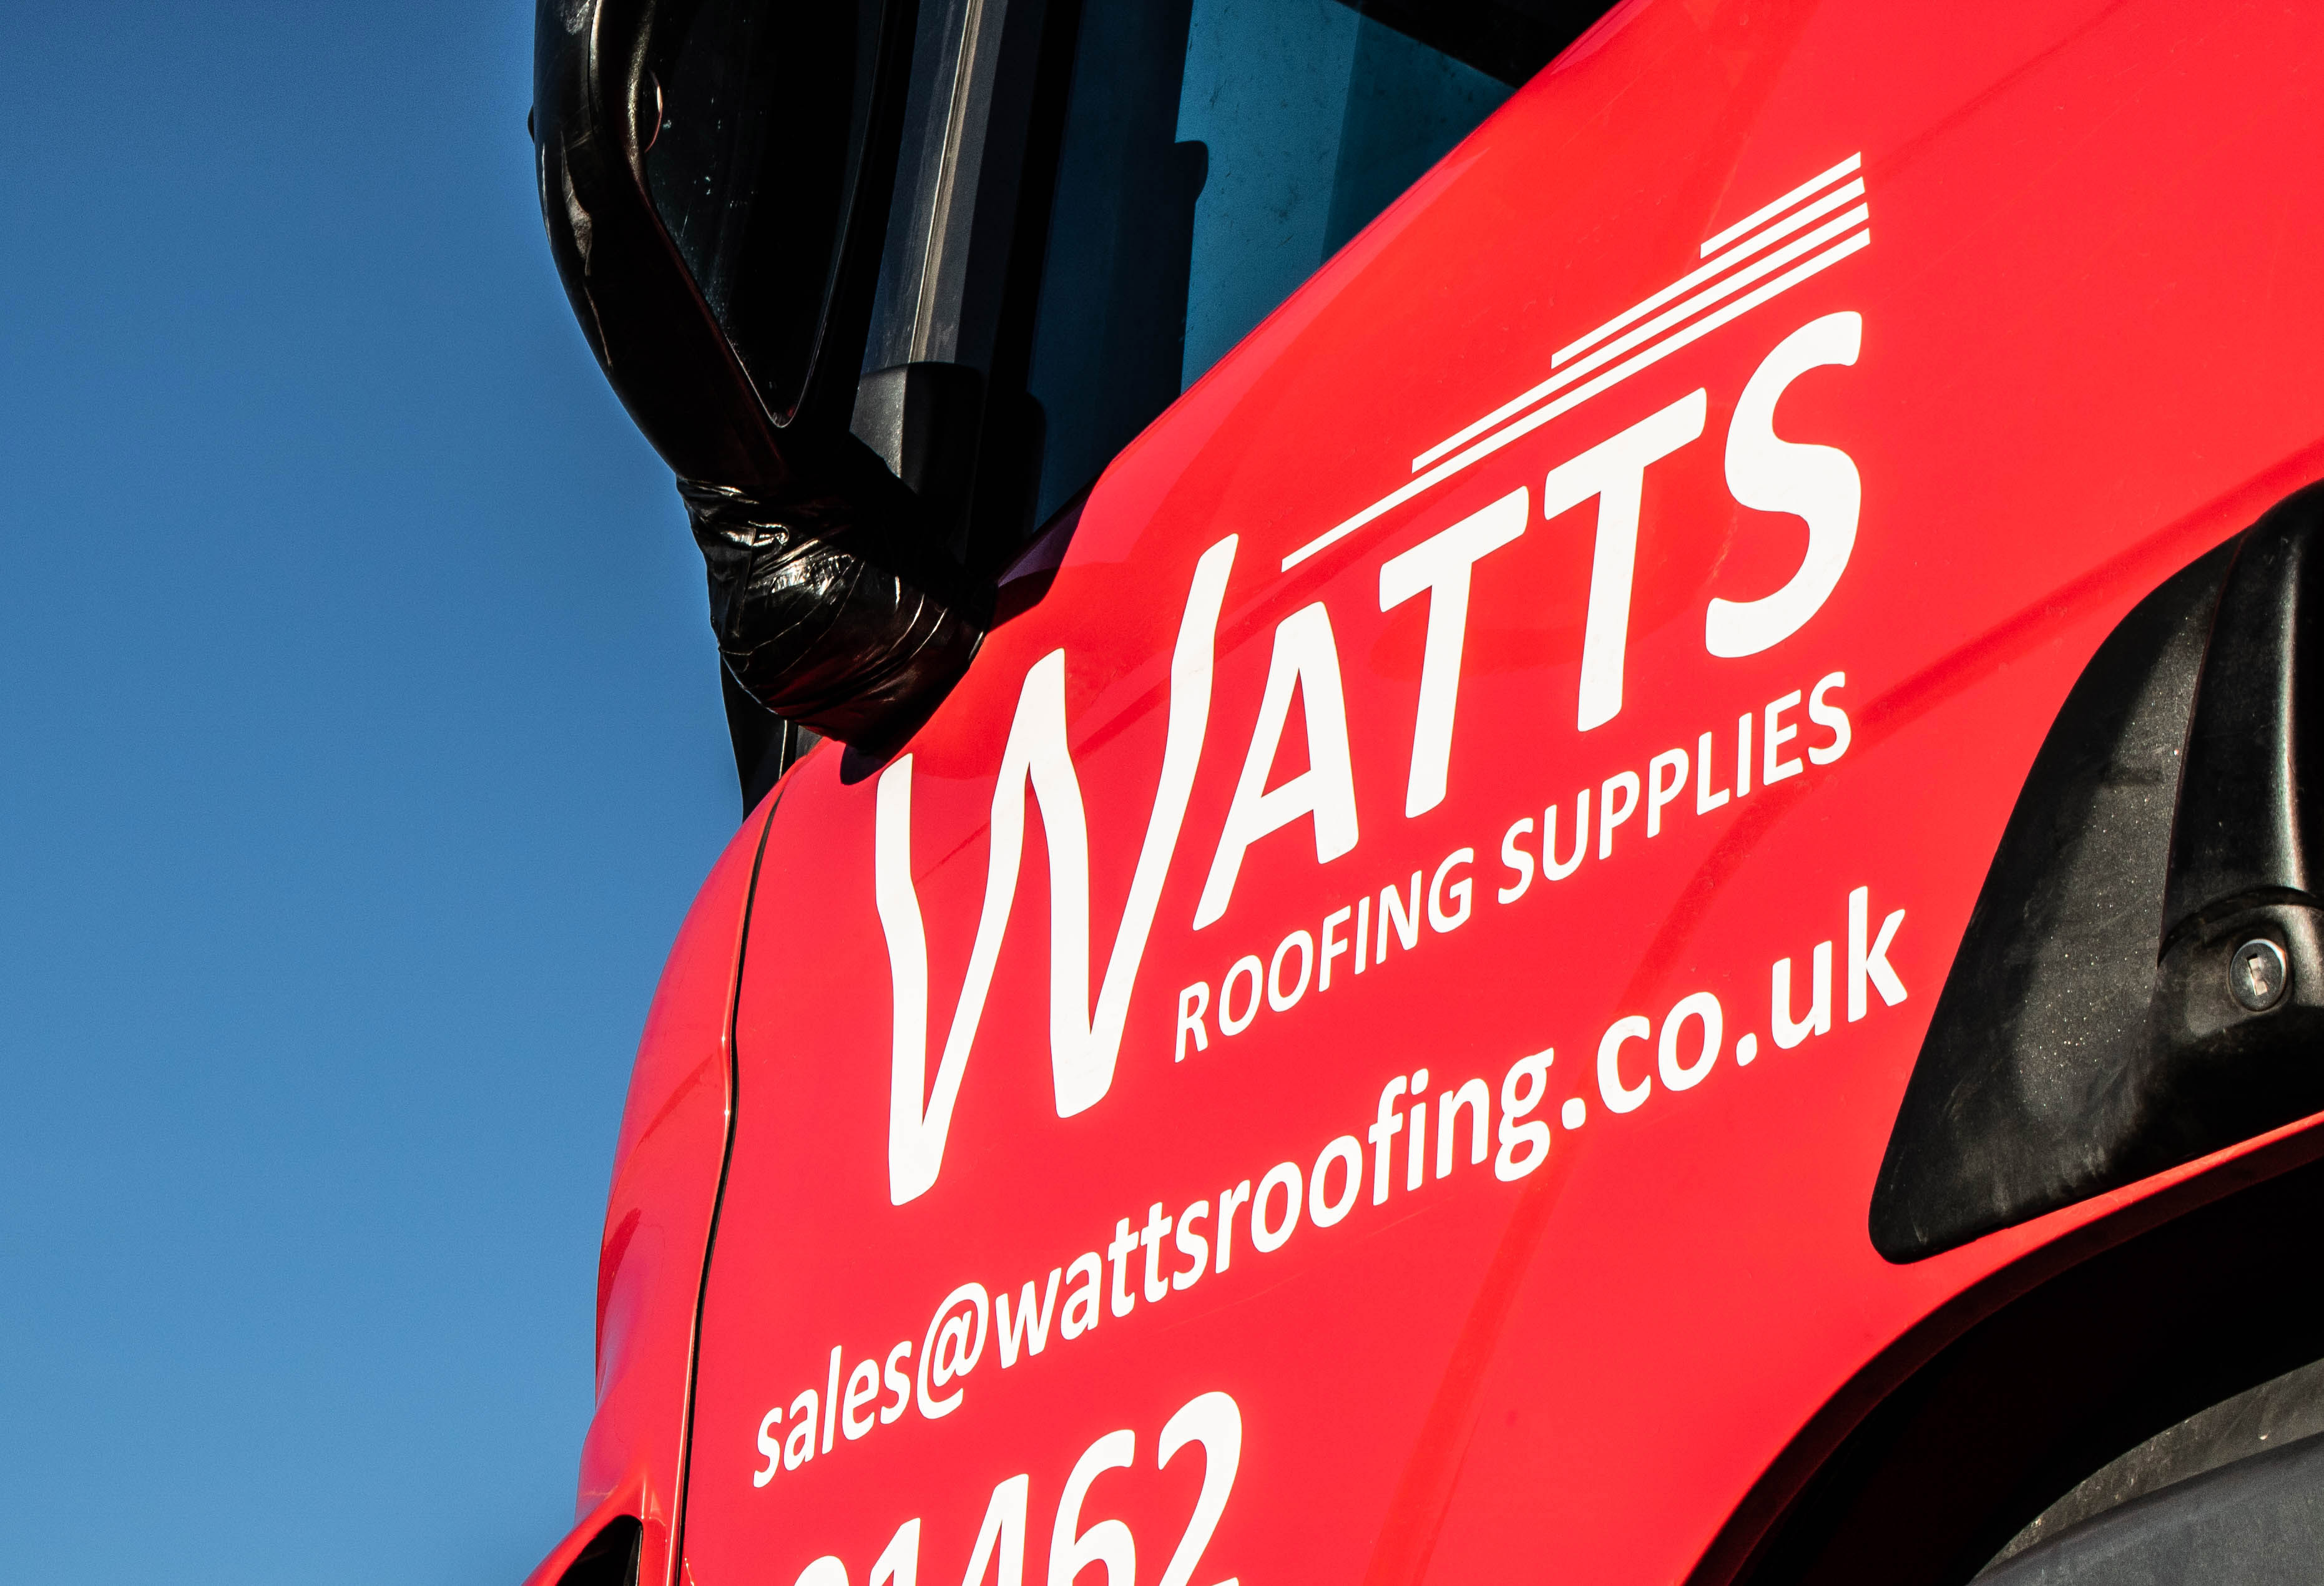 Truck - Watts Roofing Supplies